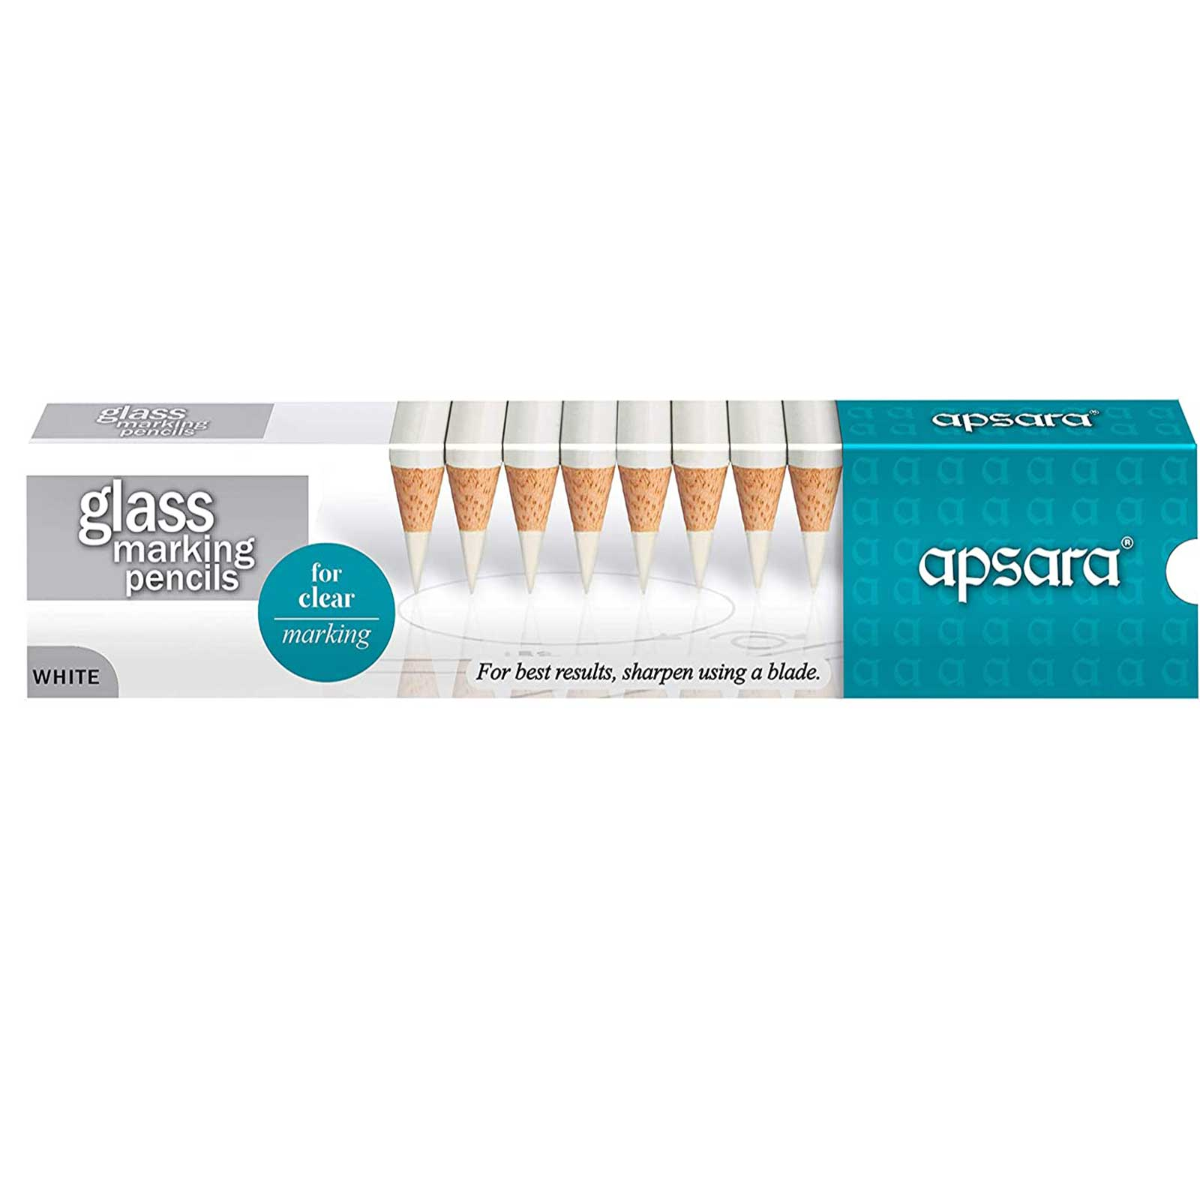 Apsara Glass Marking Pencils White 101221001W